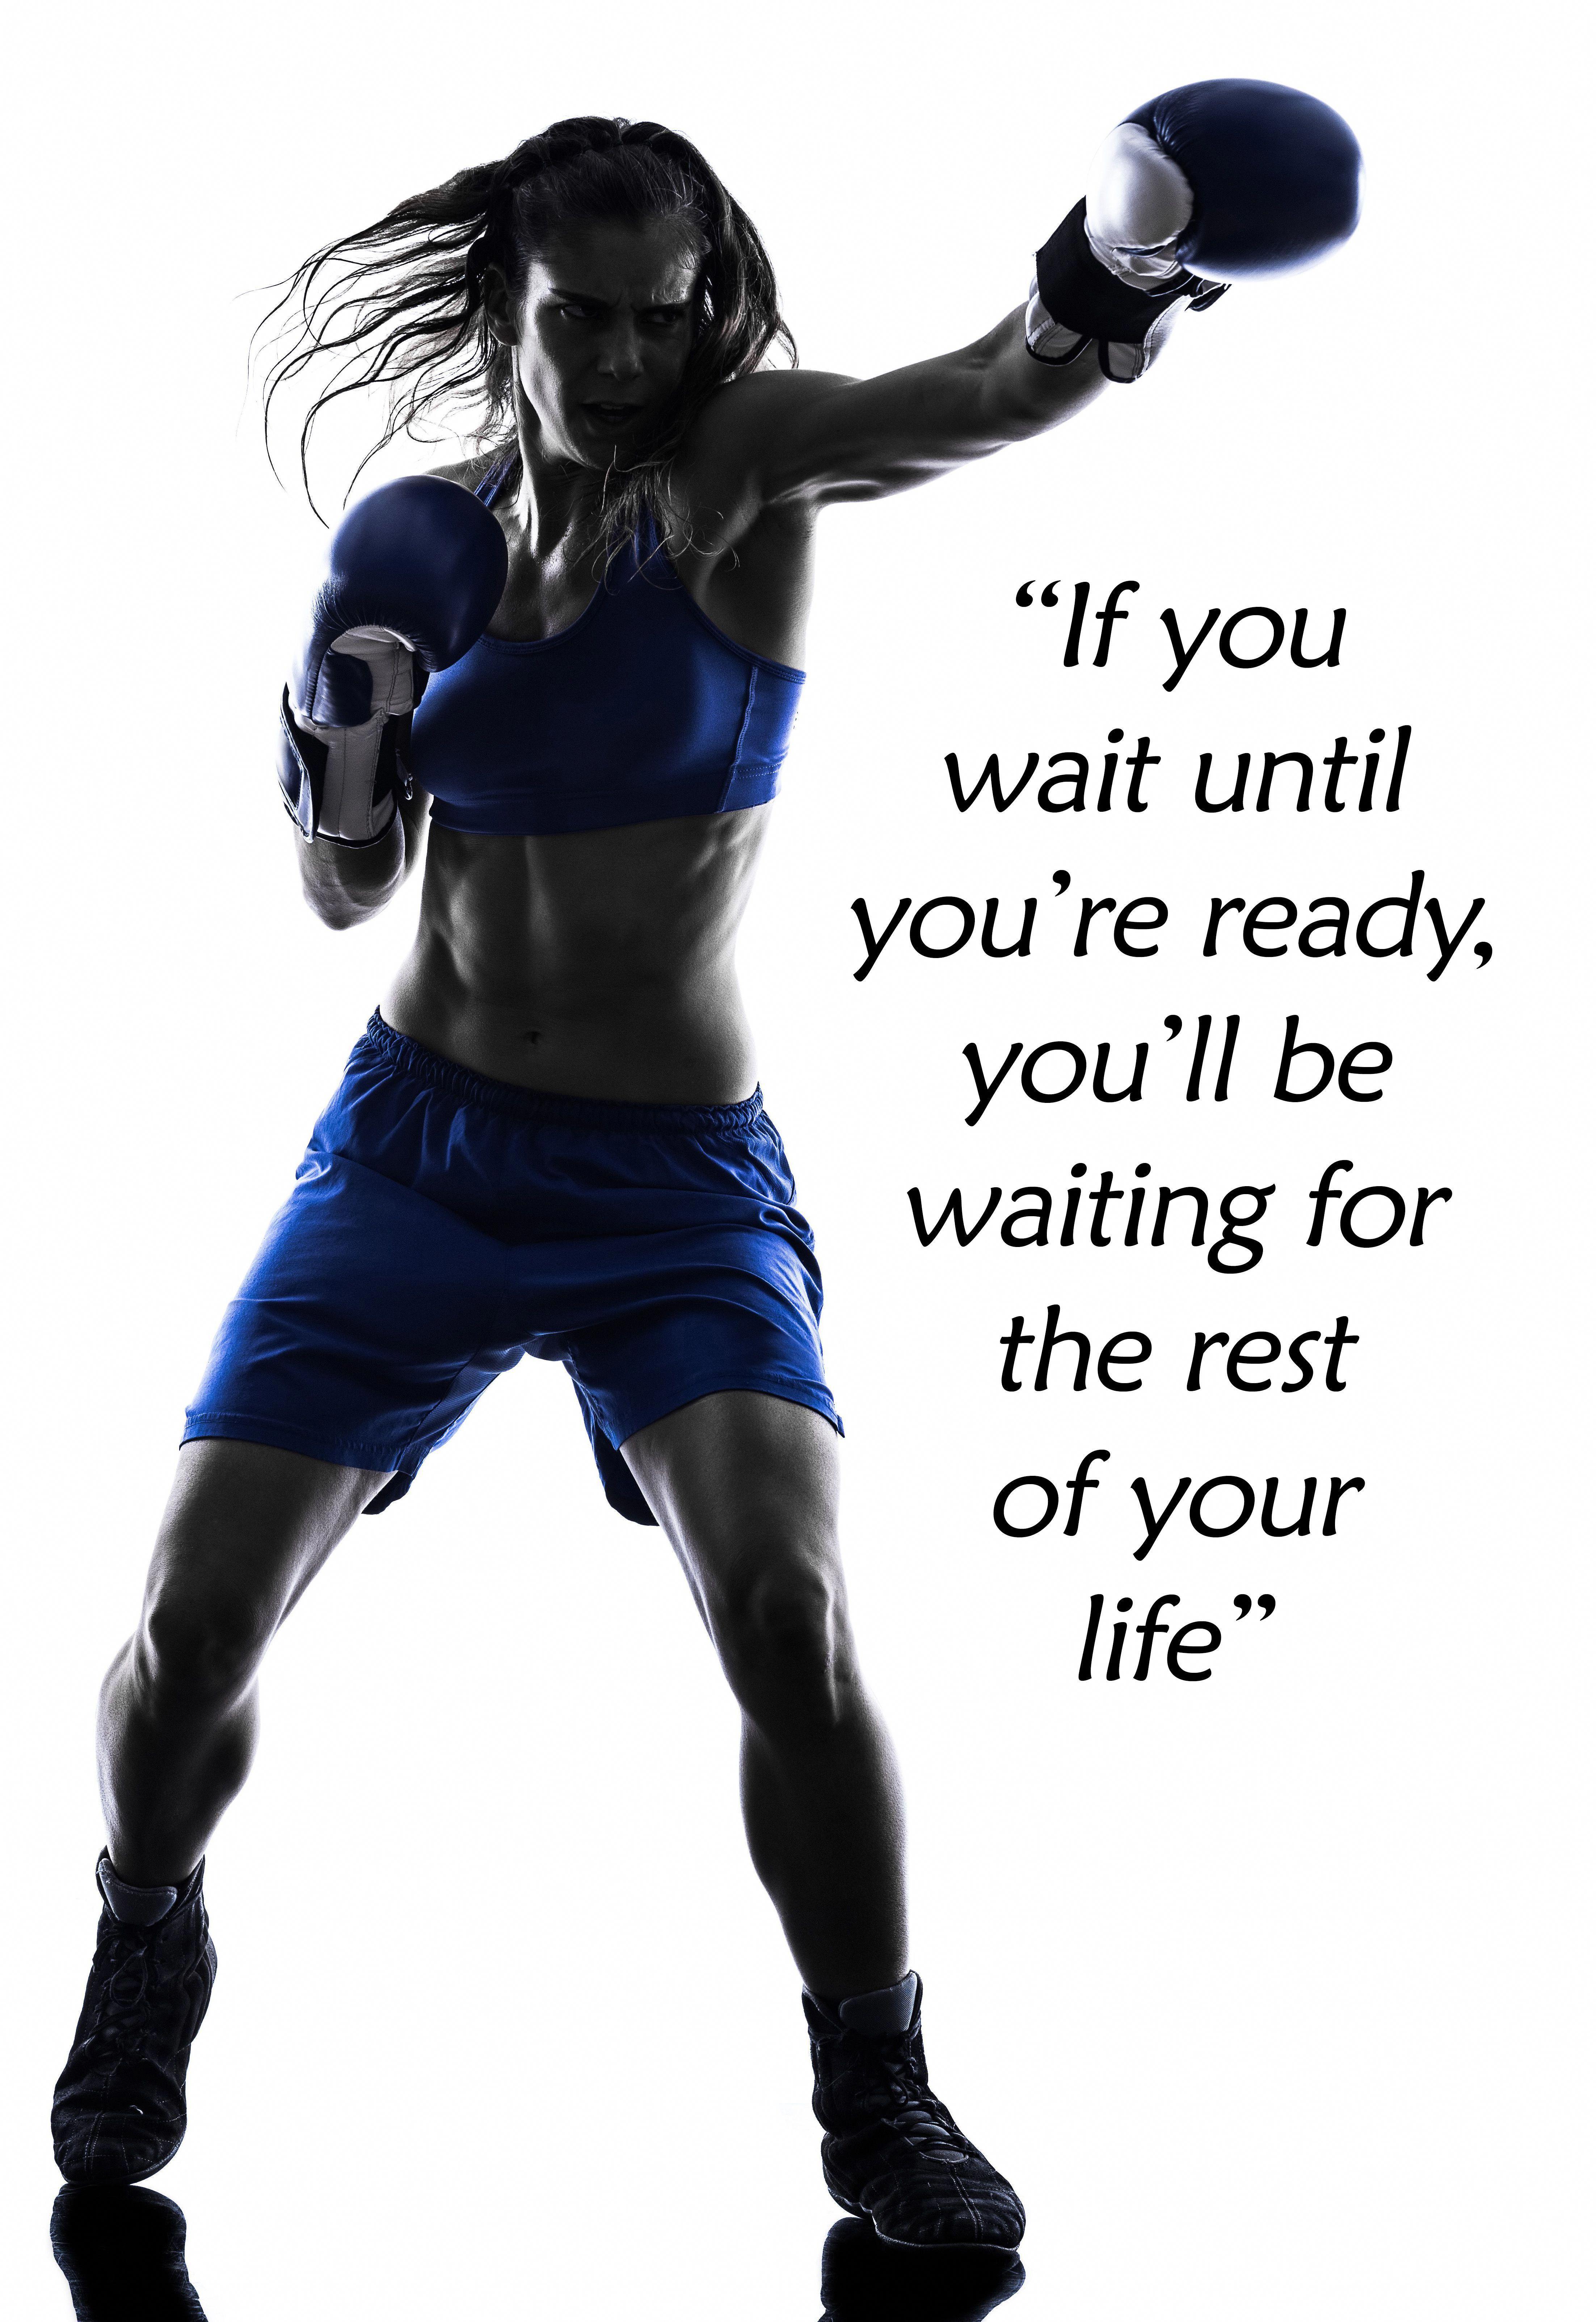 Kickboxing pad workouts, Martial Arts amp Self Defense skills training, Personal Fitness training amp m